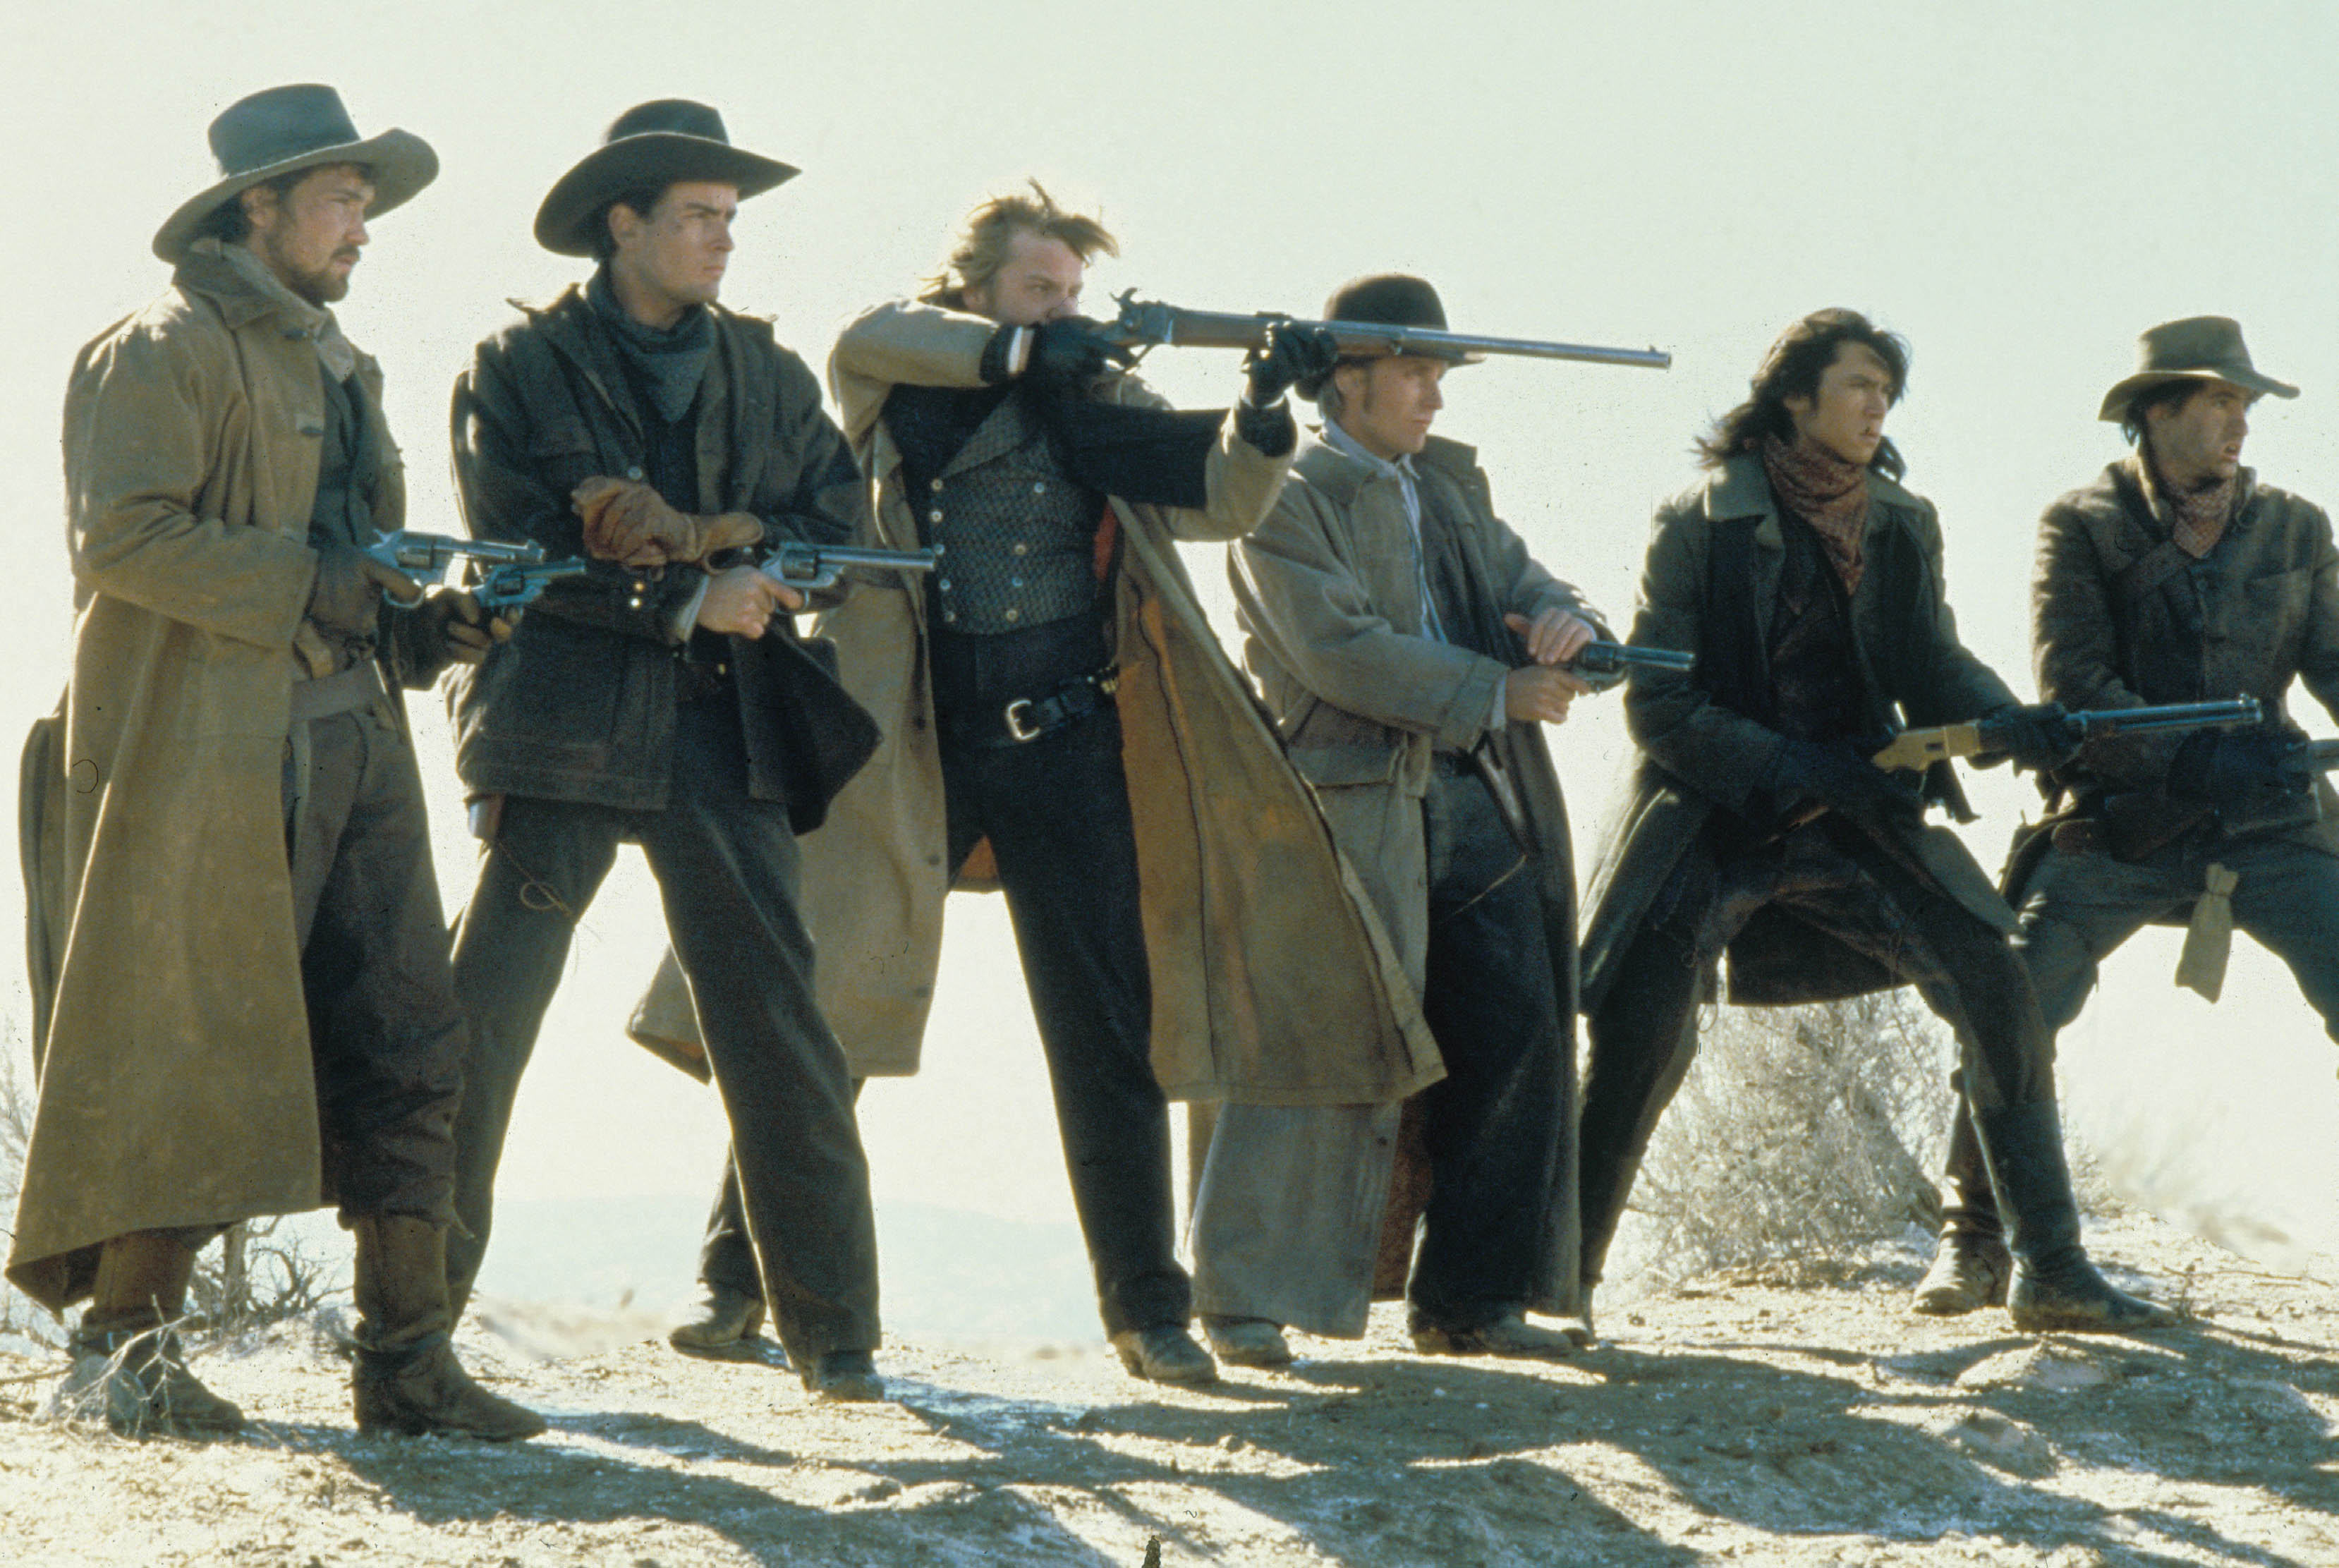 Young Guns, Casey Siemaszko, Charlie Sheen, Kiefer Sutherland, Emilio Estevez, Lou Diamond Phillips, Dermot Mulroney